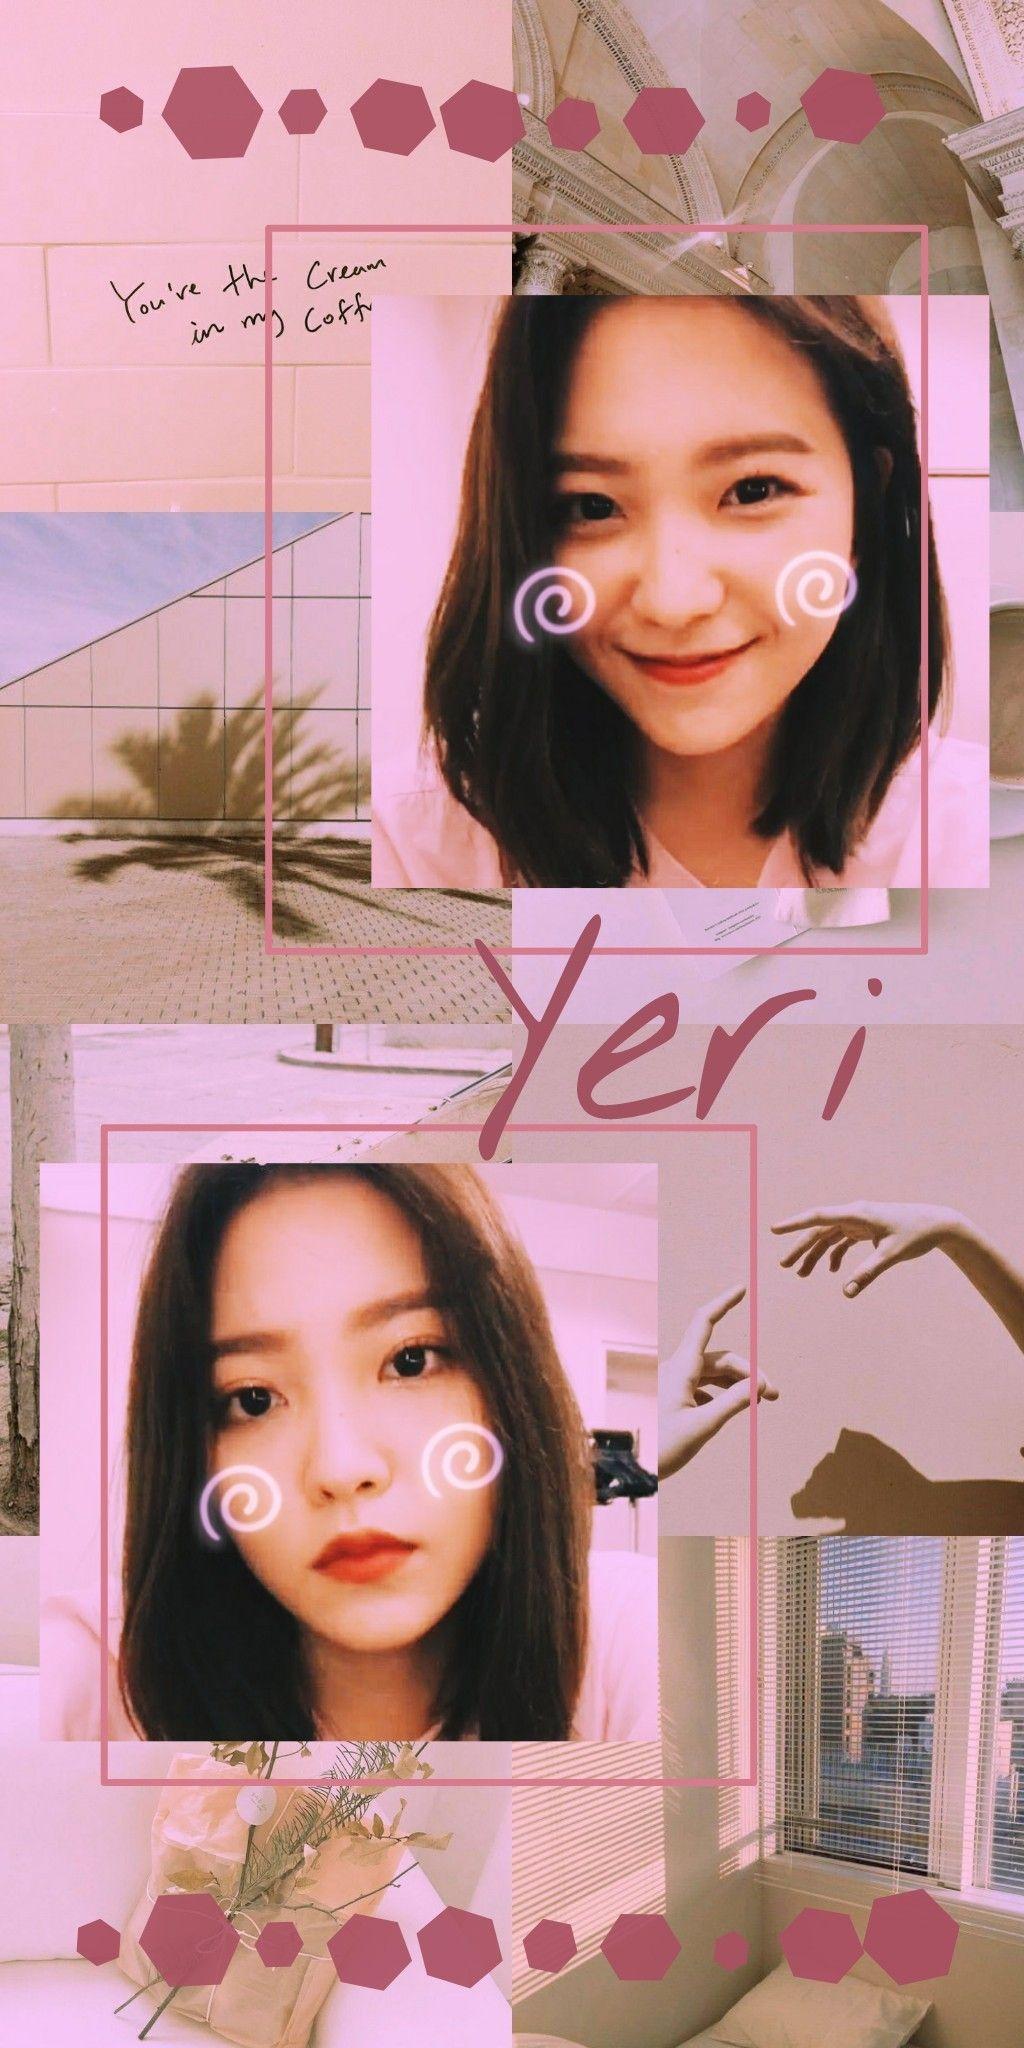 Rin Dm Yerim Wallpaper Aesthetic Redvelvet Aesthetic Yeri Gadis Gambar Pasangan Gadis Korea